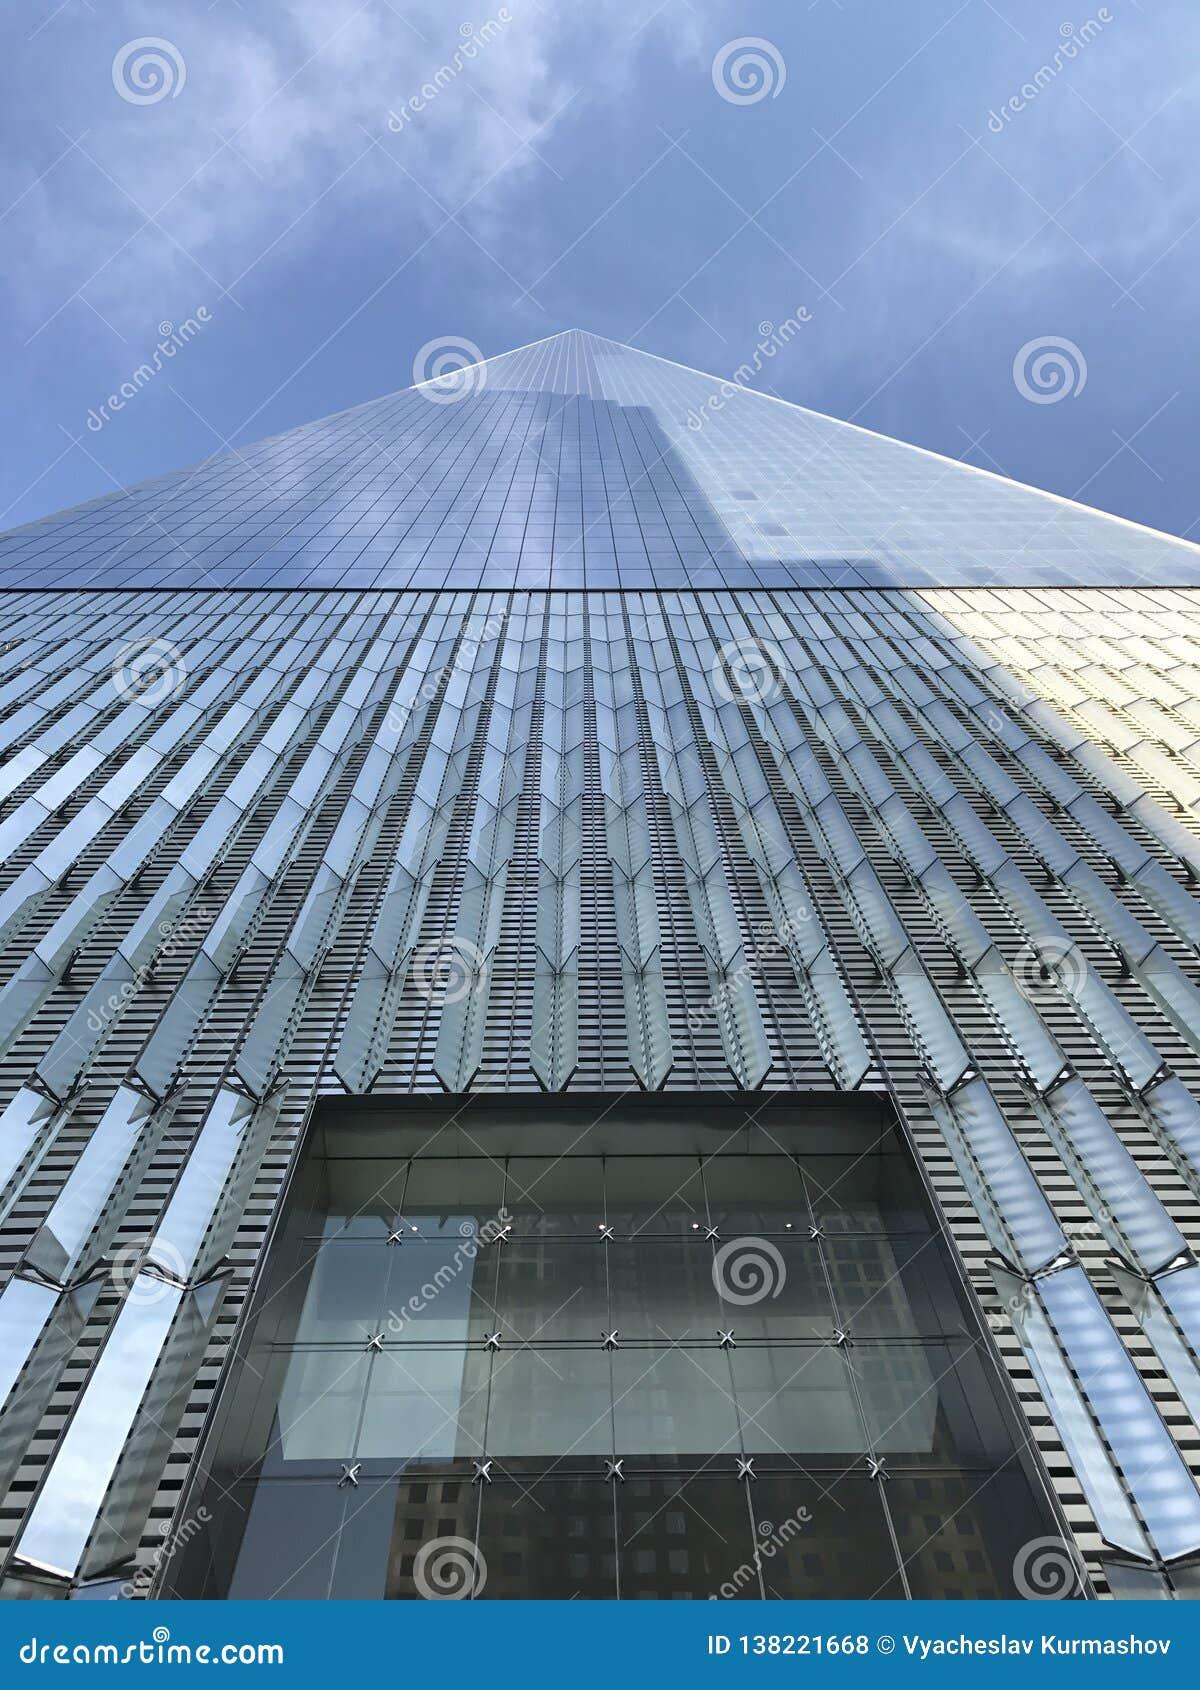 World Trade Center look up